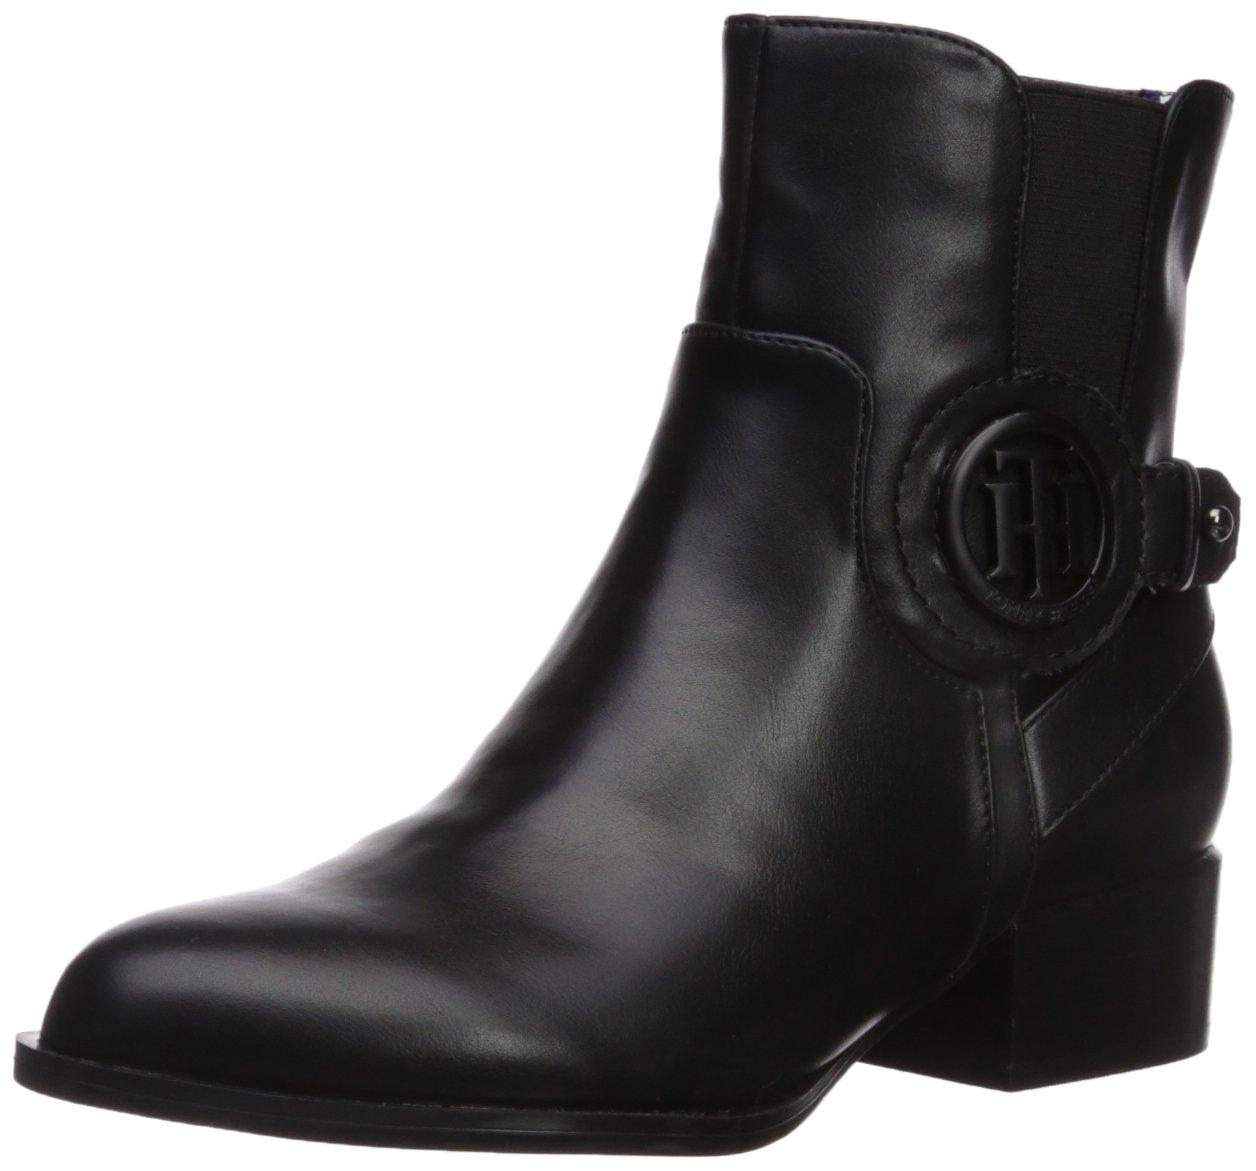 Tommy Hilfiger Women's Mavrick Ankle Boot B06XVJYX2Z 9 B(M) US|Black